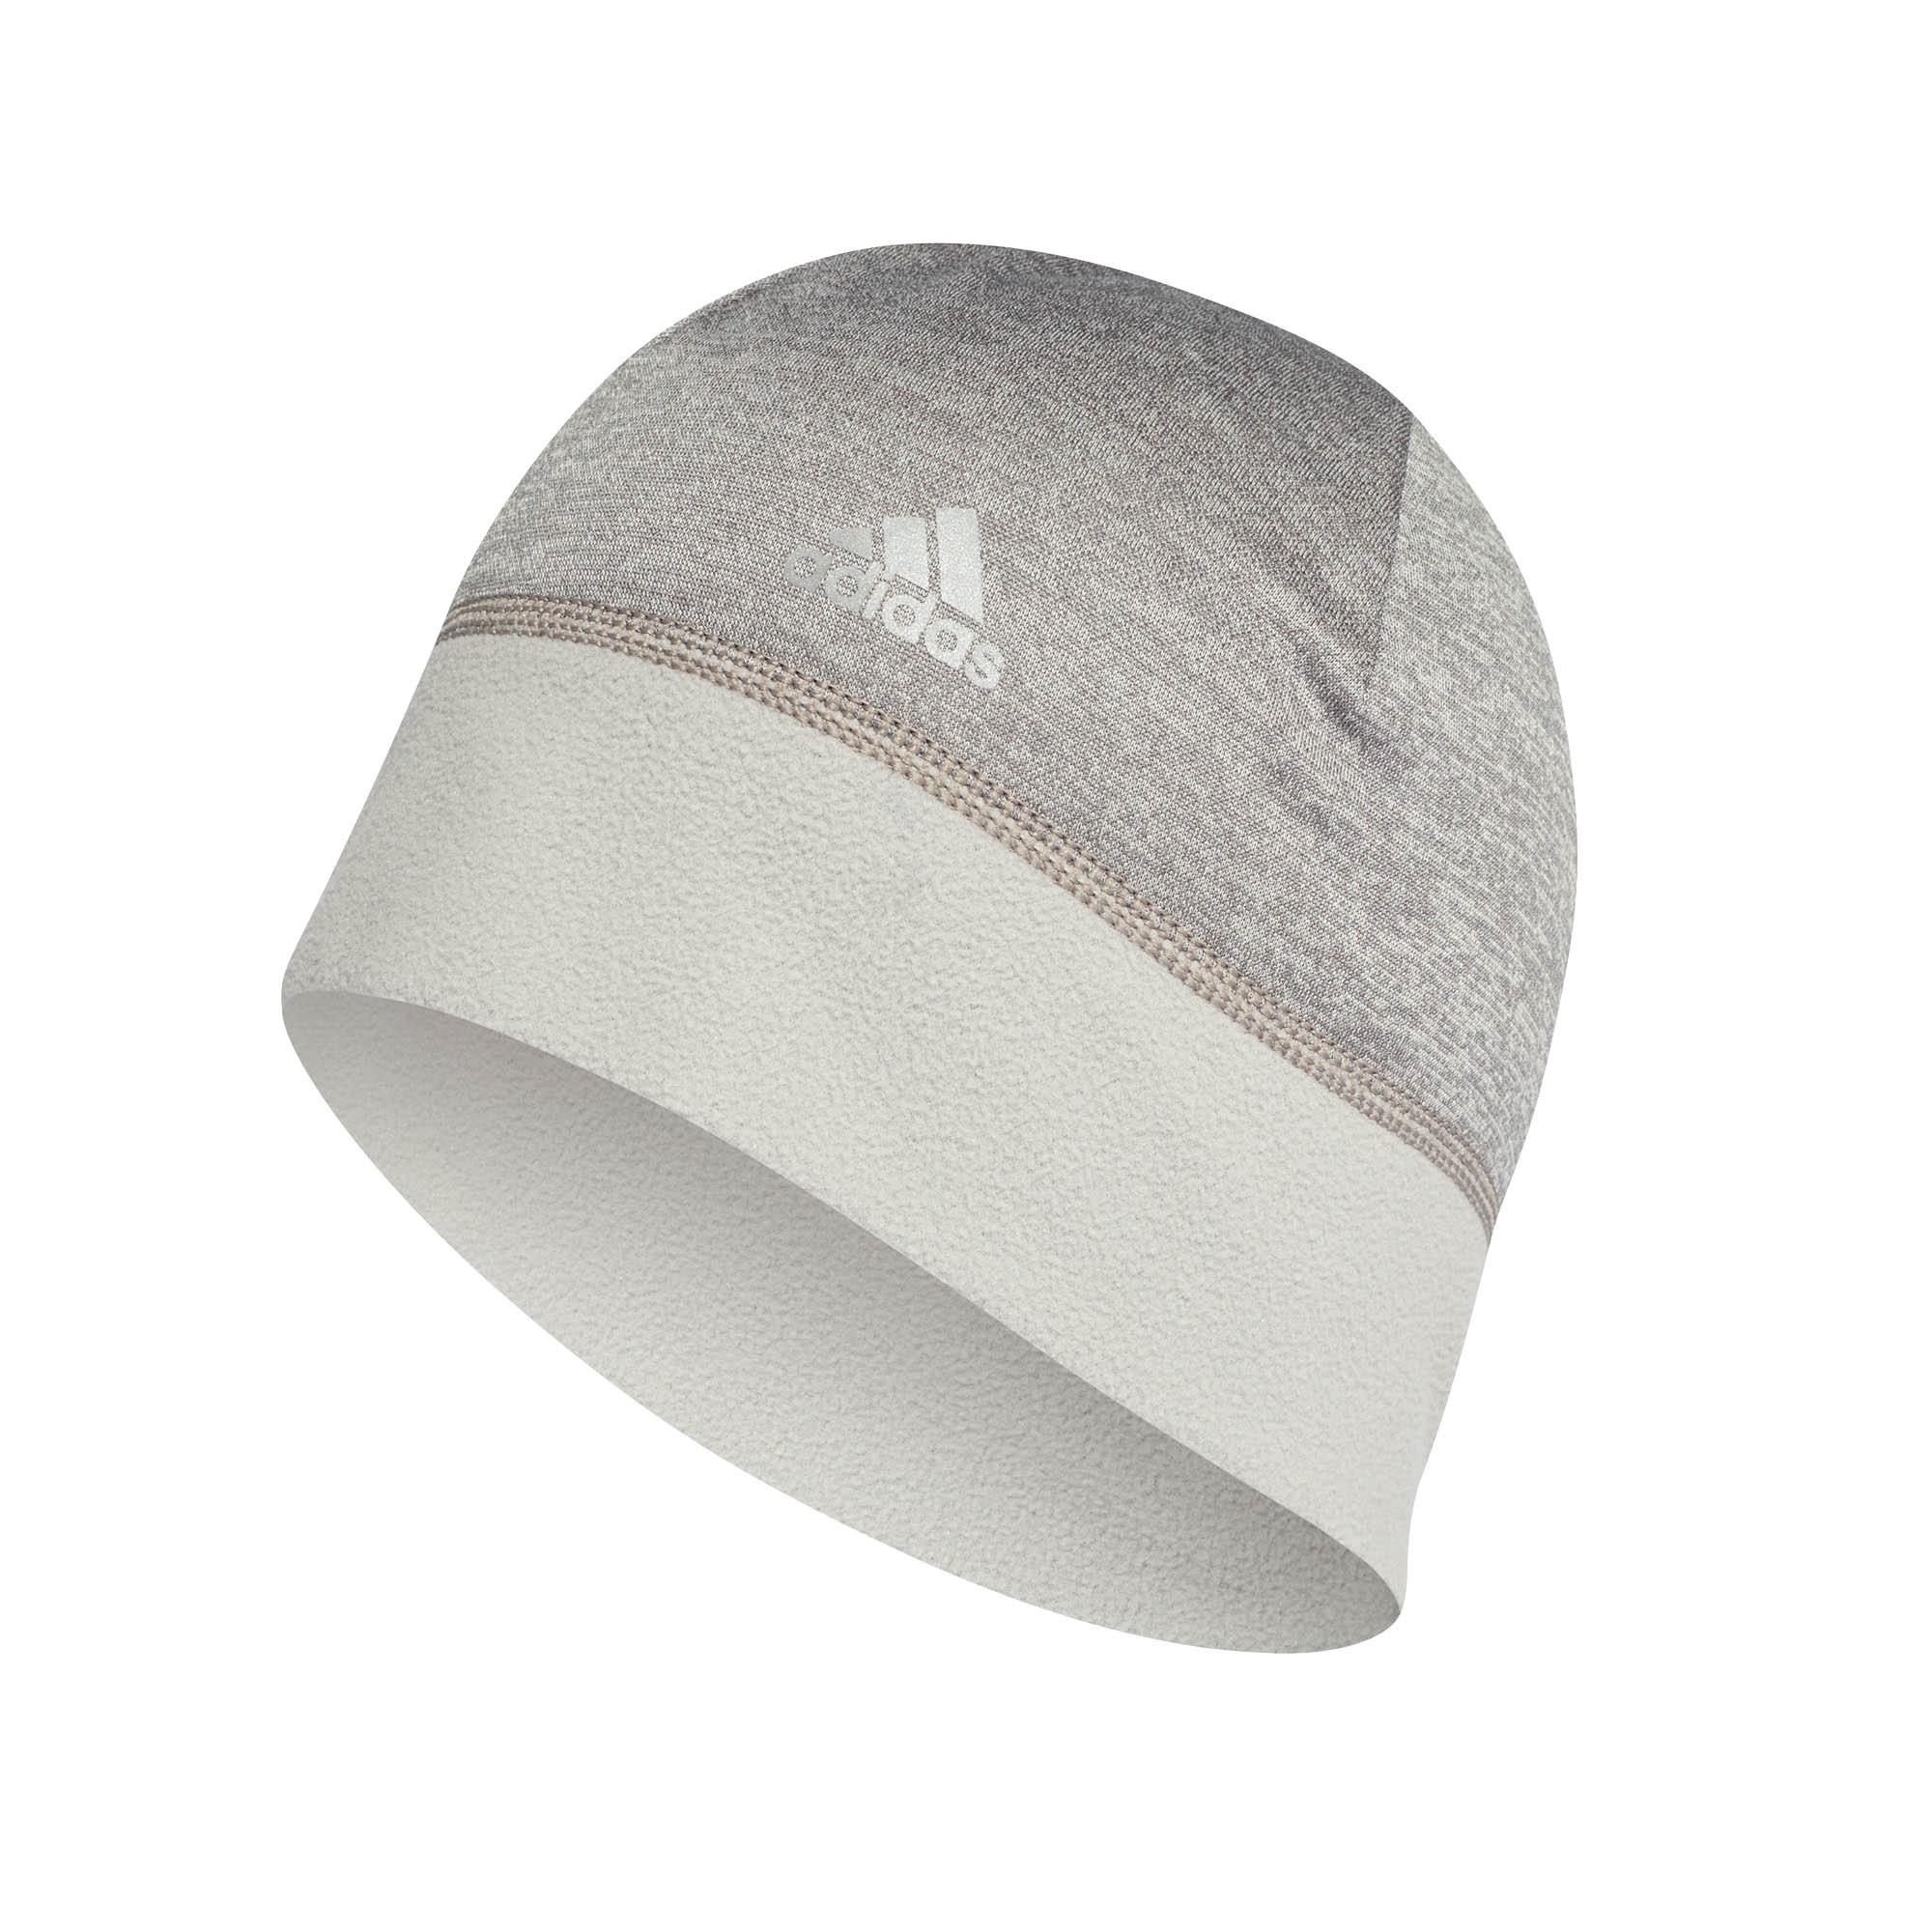 Adidas Climawarm Sport Running Training Fleece Mens Beanie cappello grigio 3c181ee78d73